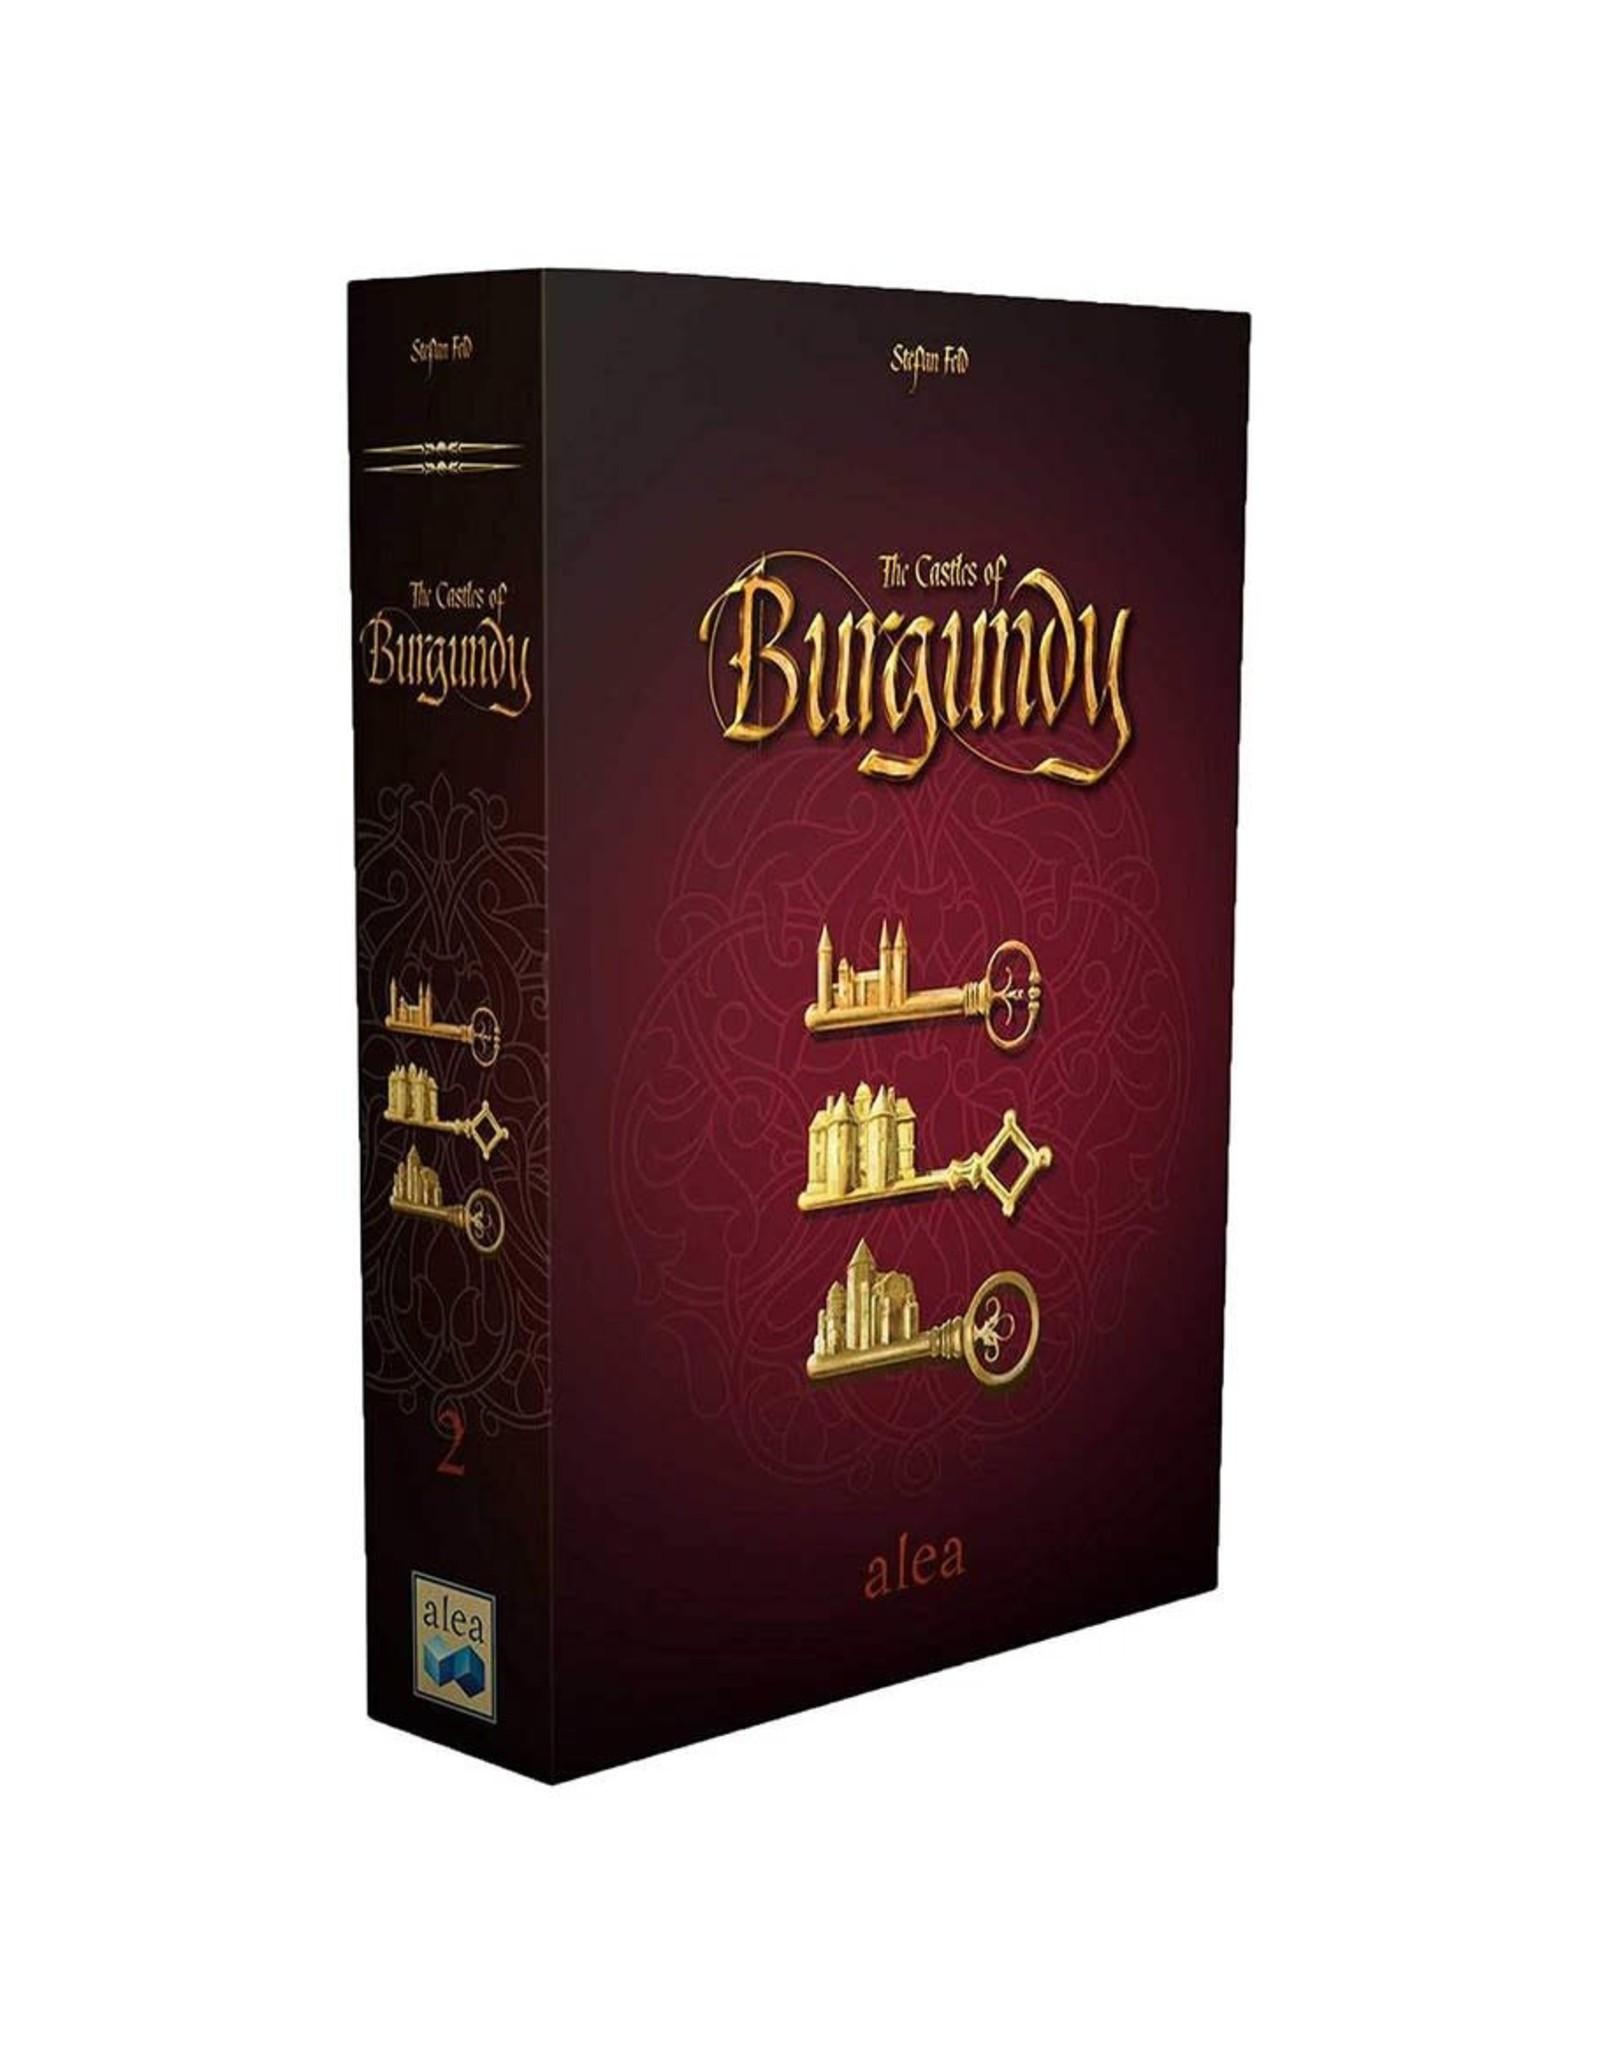 Ravensburger Castles of Burgundy 20th Anniversary Edition